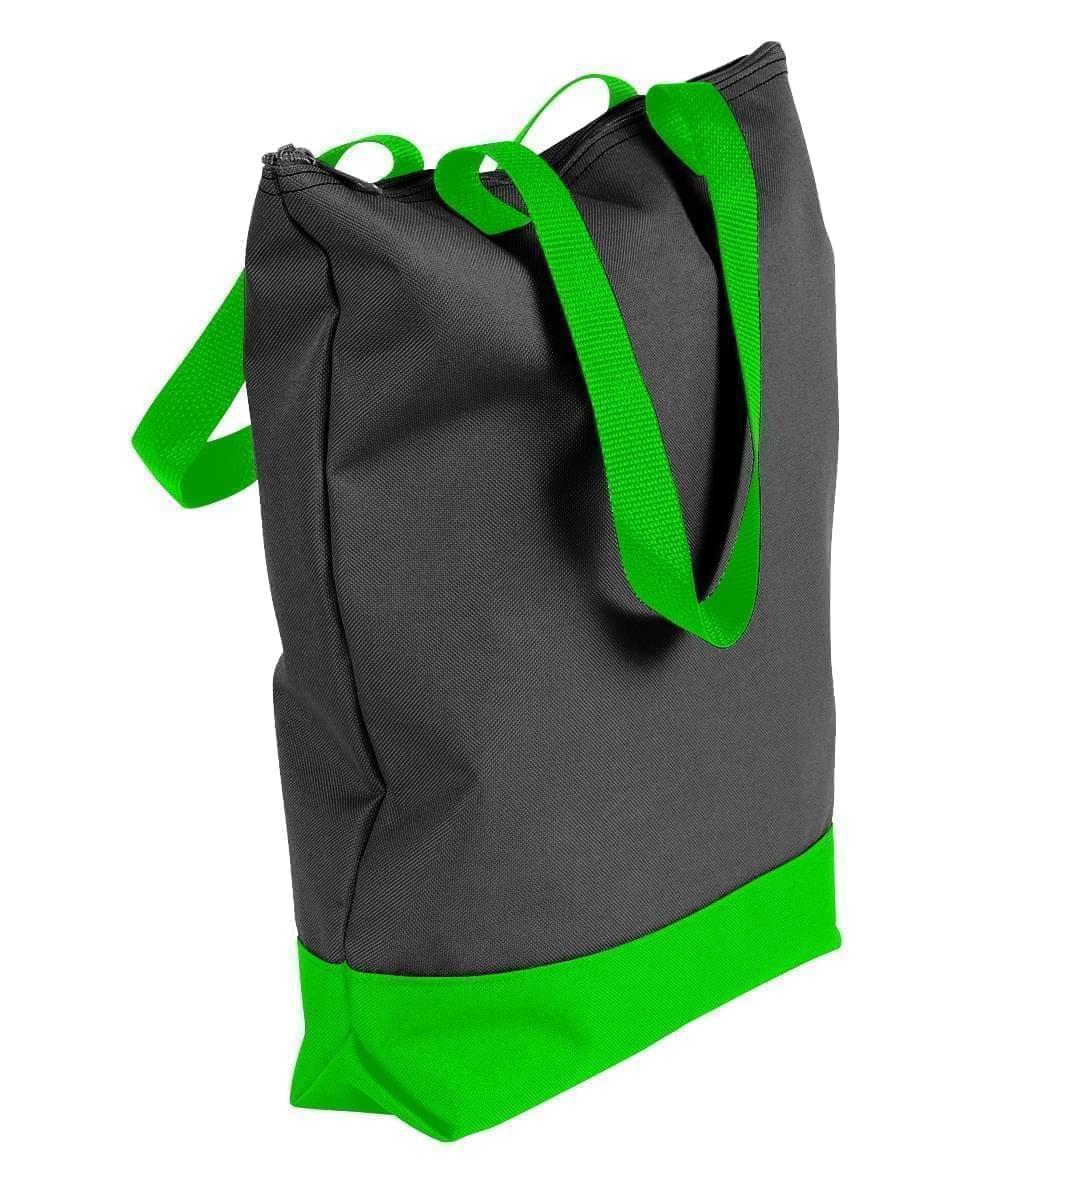 USA Made Canvas Portfolio Tote Bags, Black-Lime, 1AAMX1UAHY